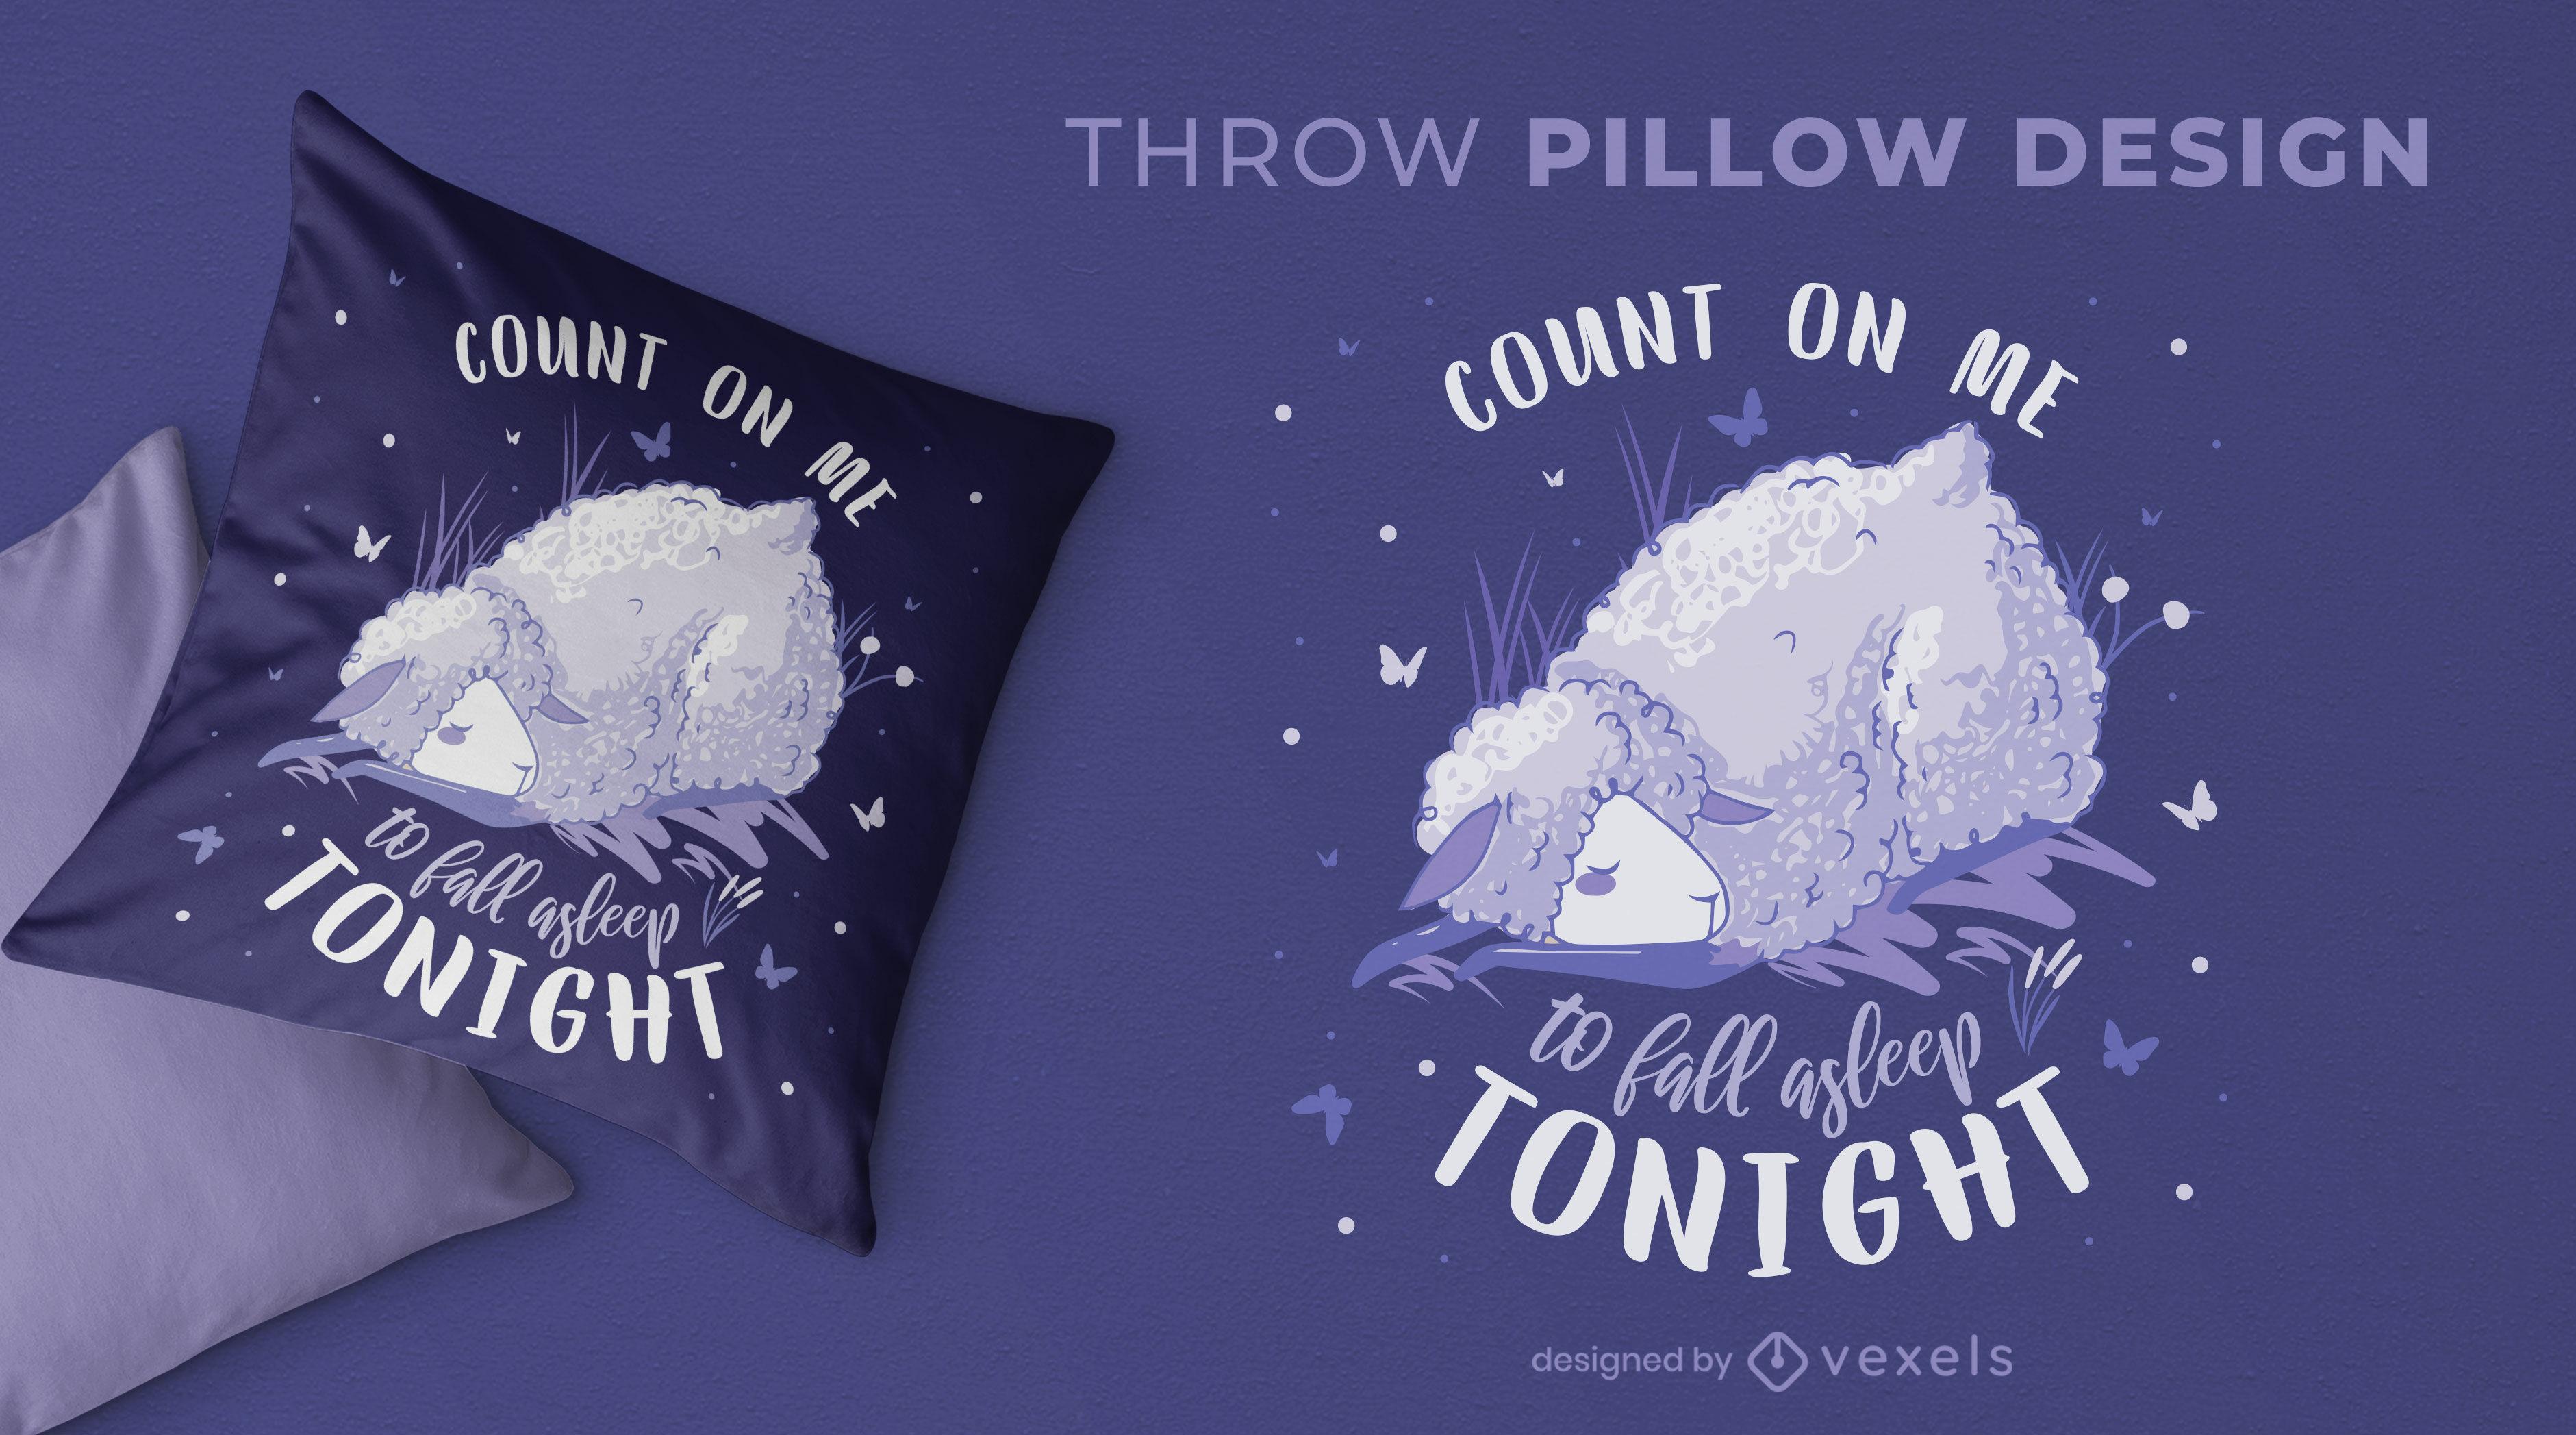 Sleeping sheep animal throw pillow design